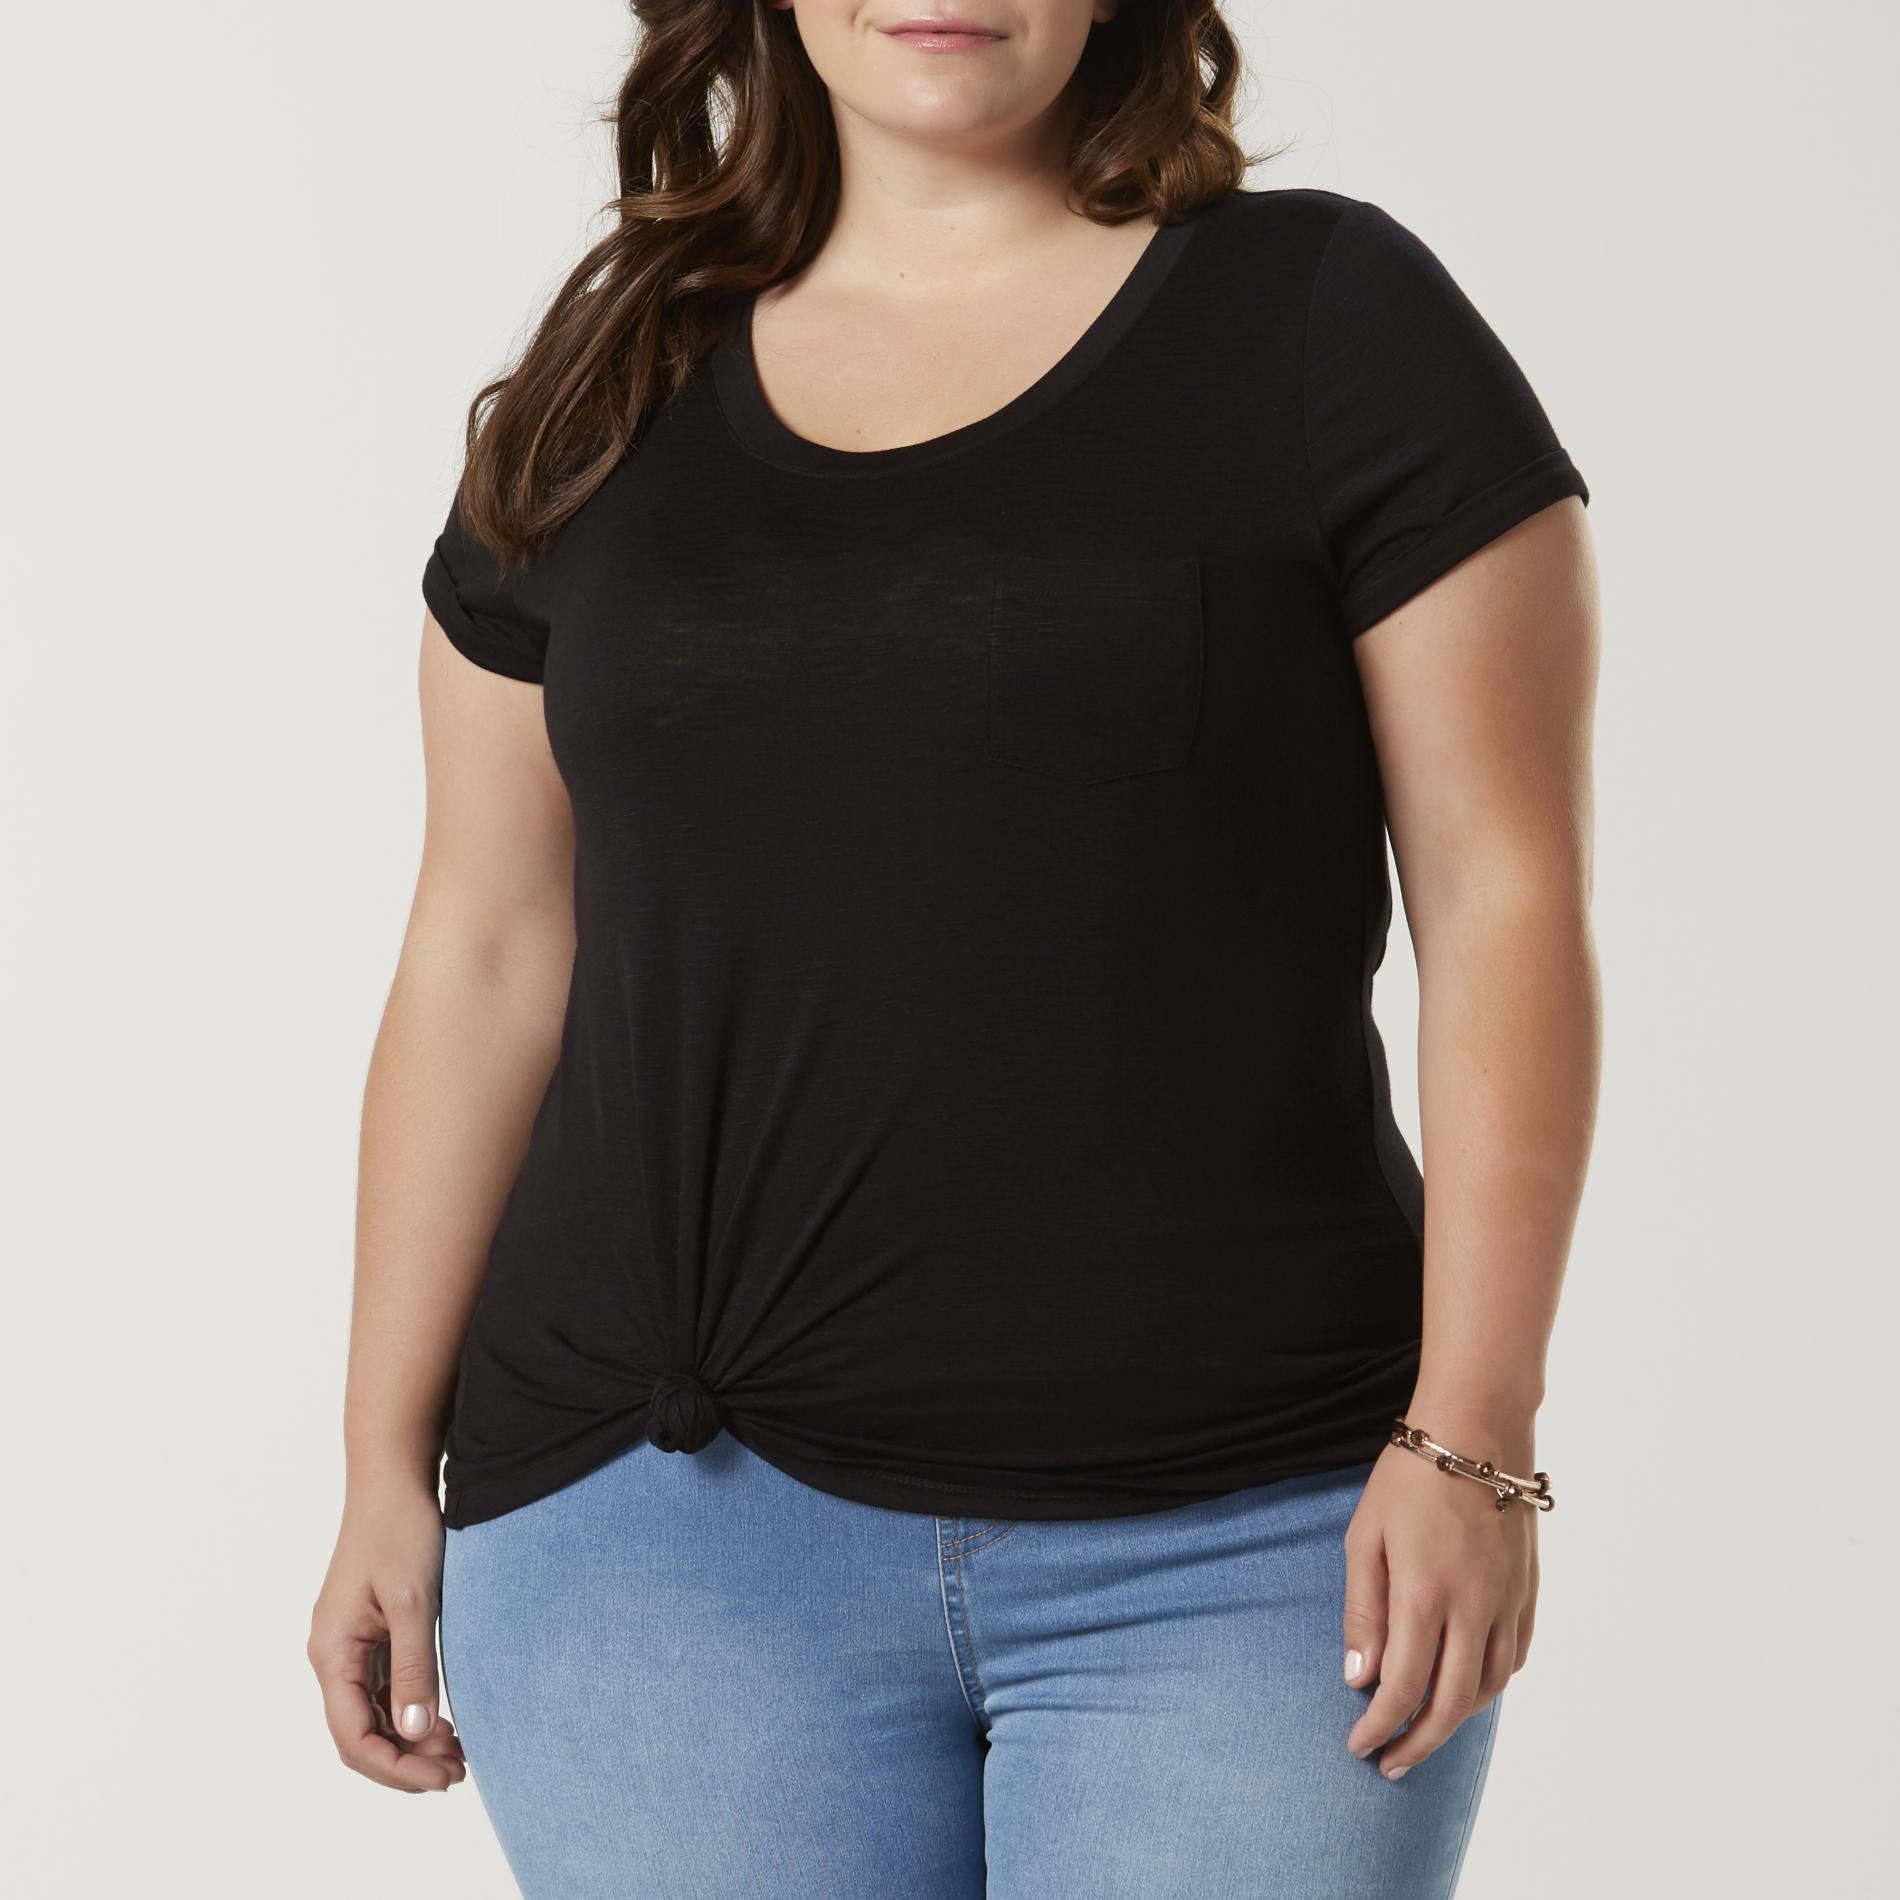 Simply Emma Women's Plus Pocket T-Shirt, Size: 1XL, Black Black